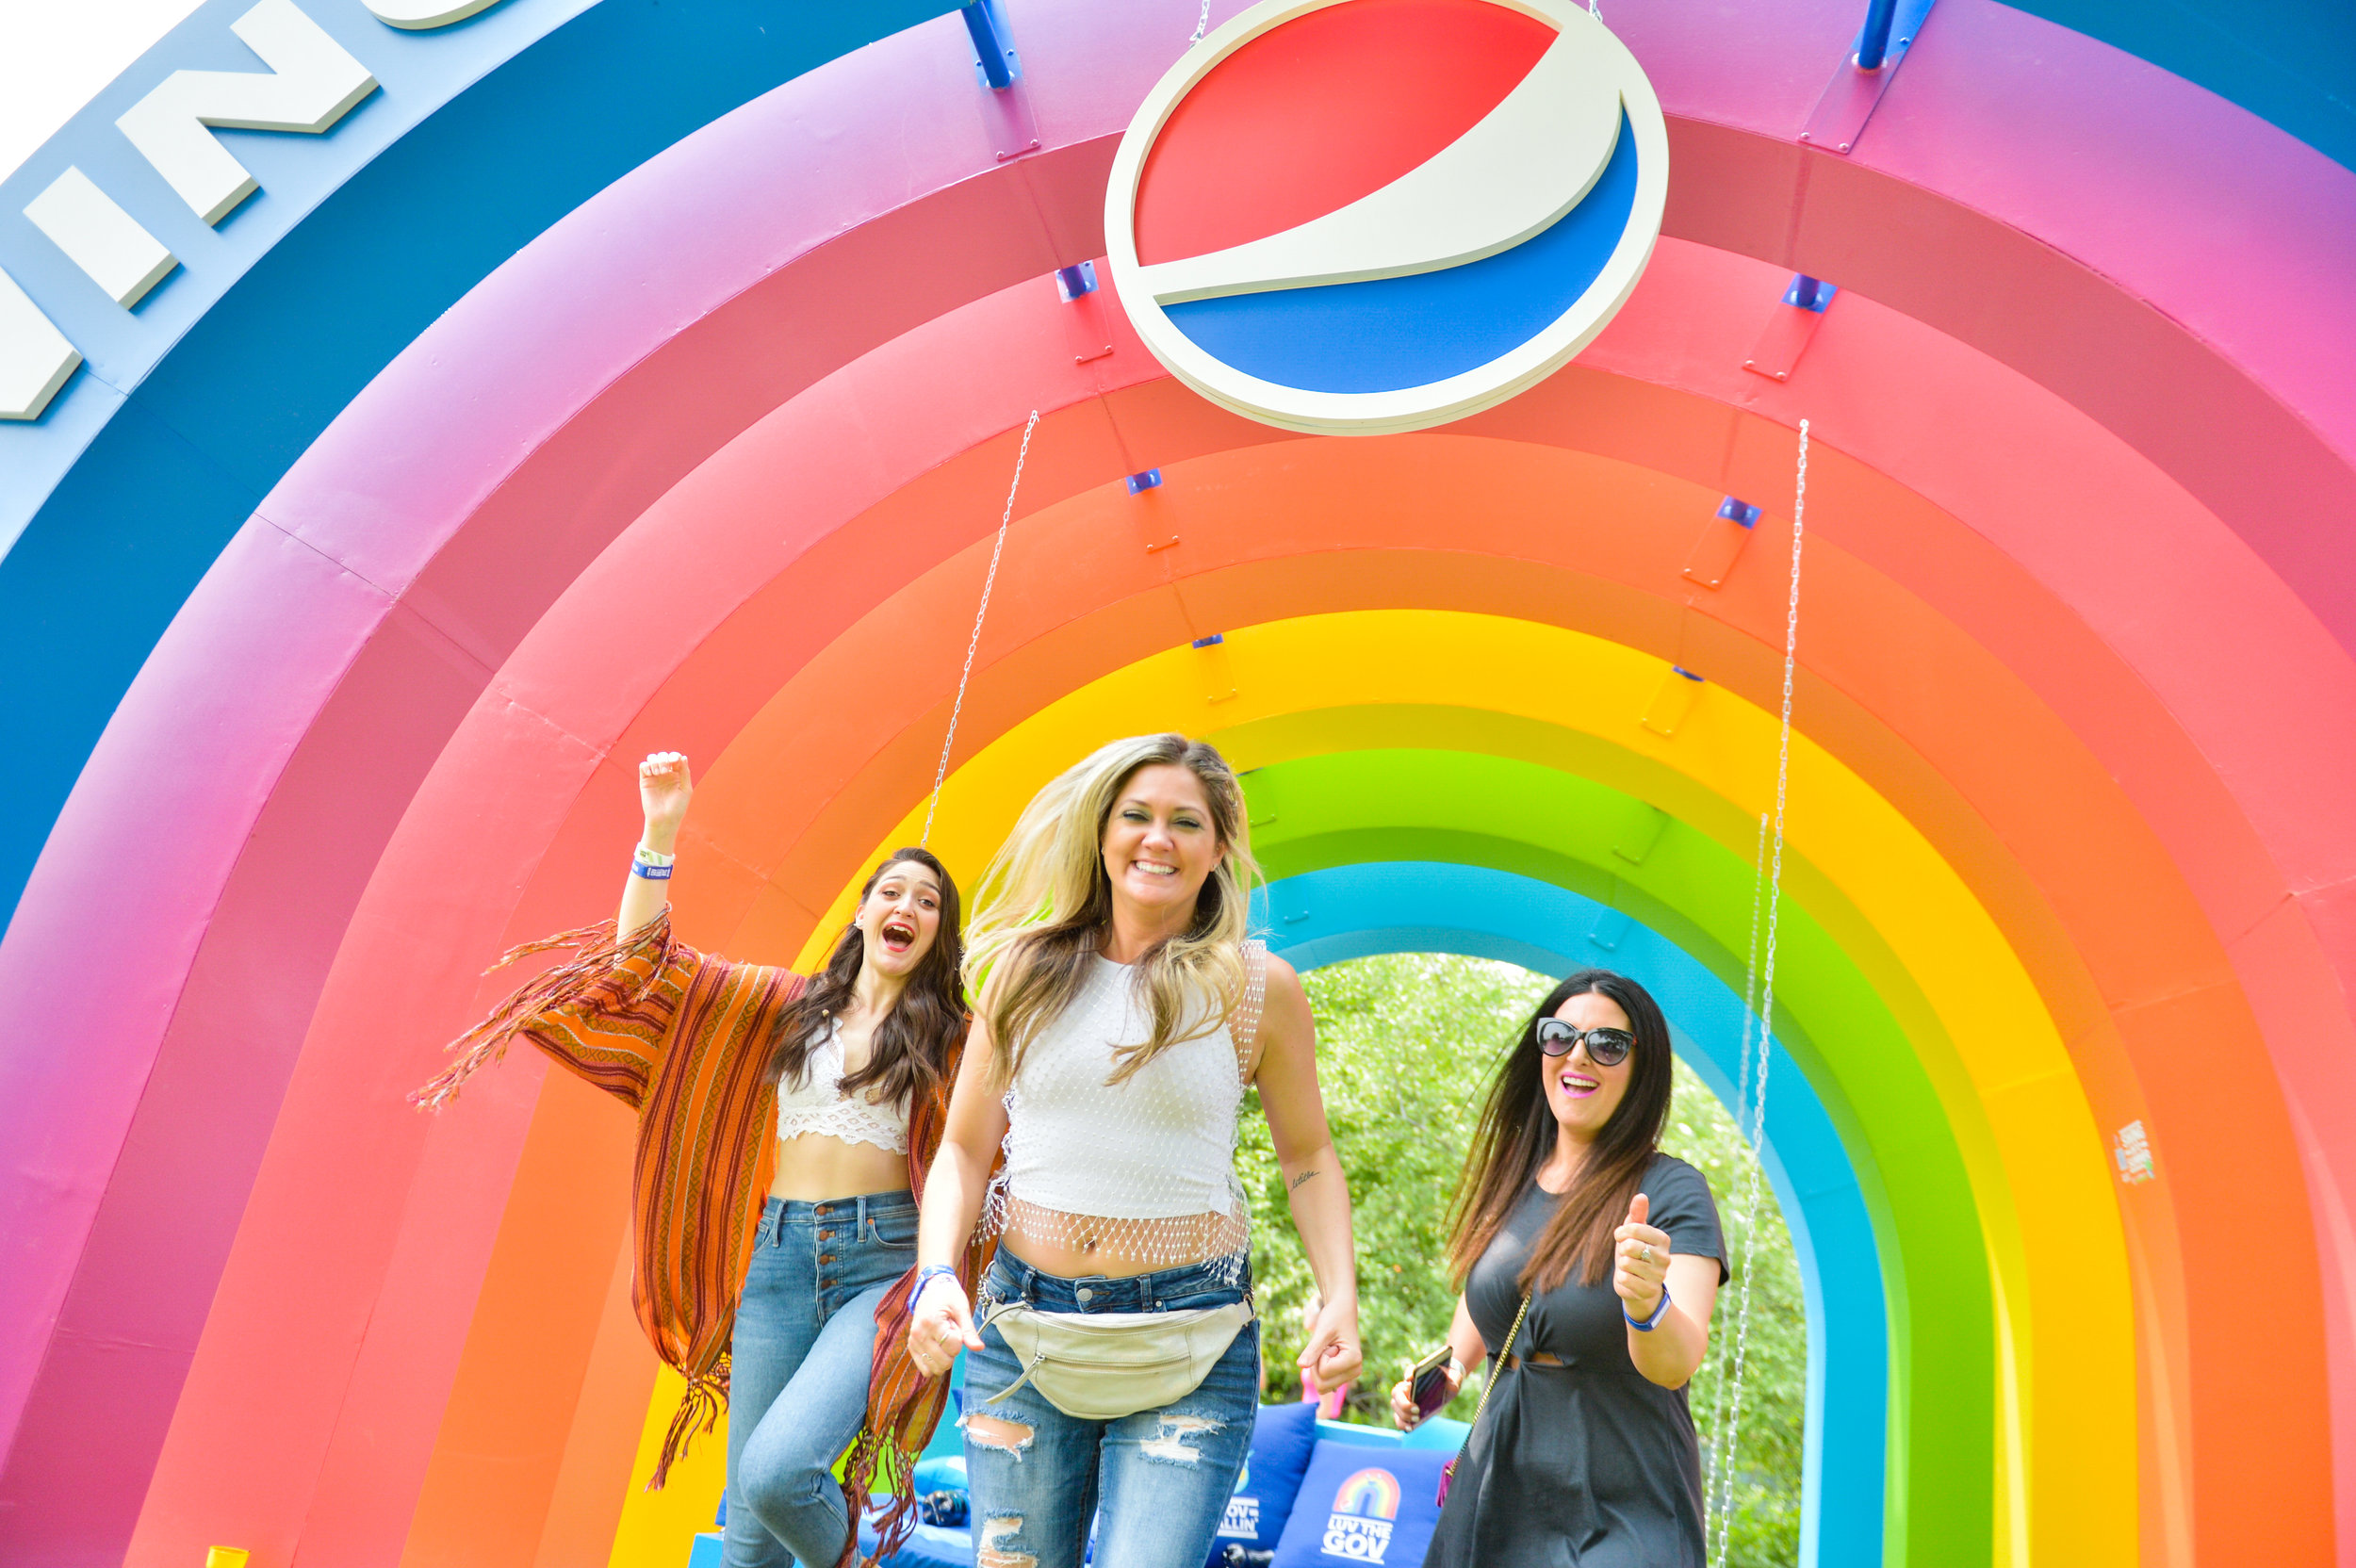 OHelloMedia-Pepsi-GovernorsBall-TopSelects-4.jpg